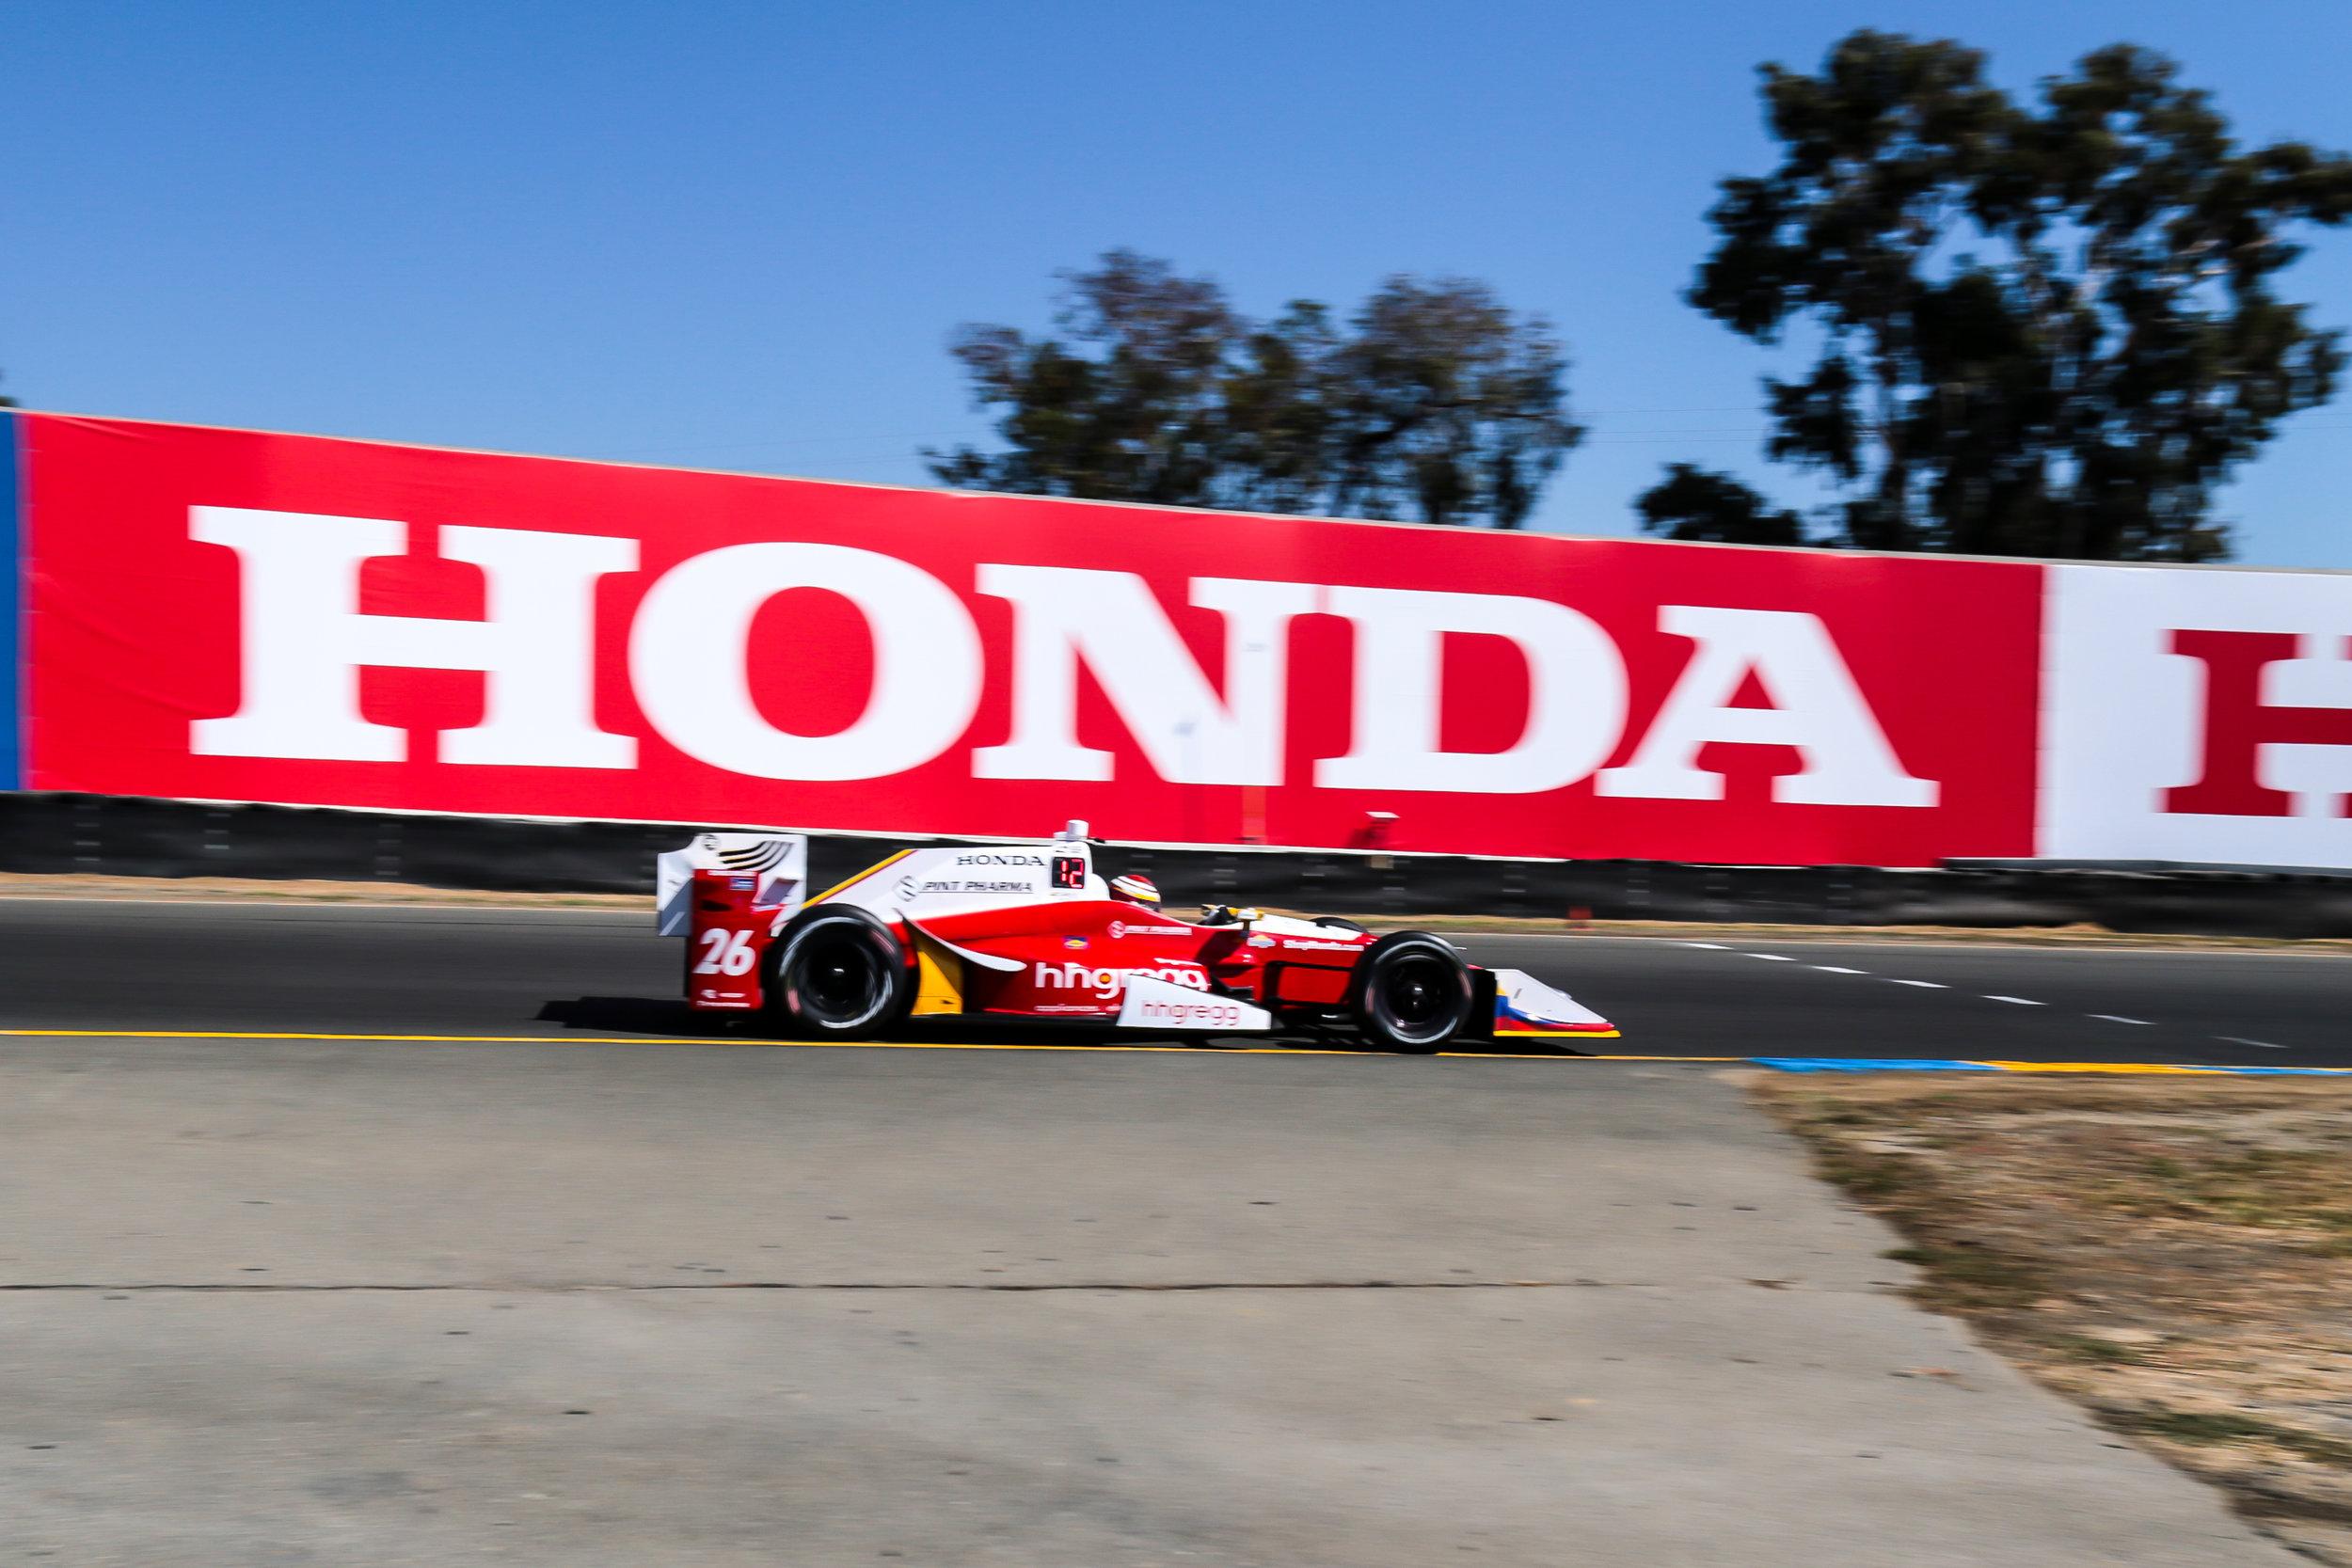 Indy16-2787.jpg